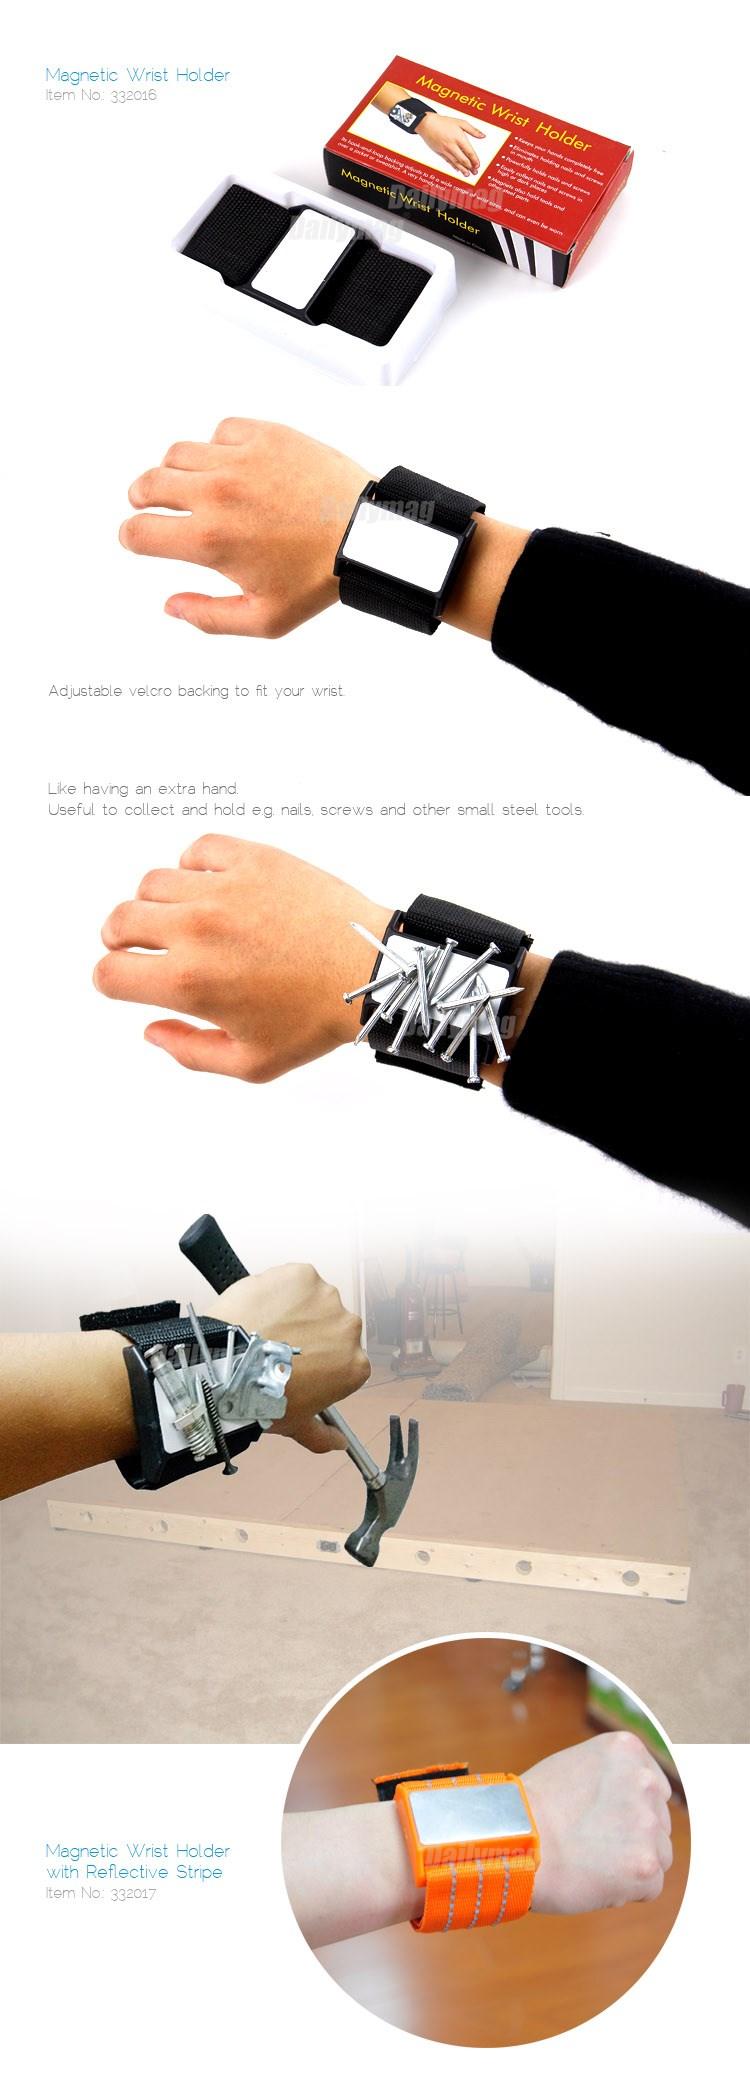 332016 wrist holder+.jpg